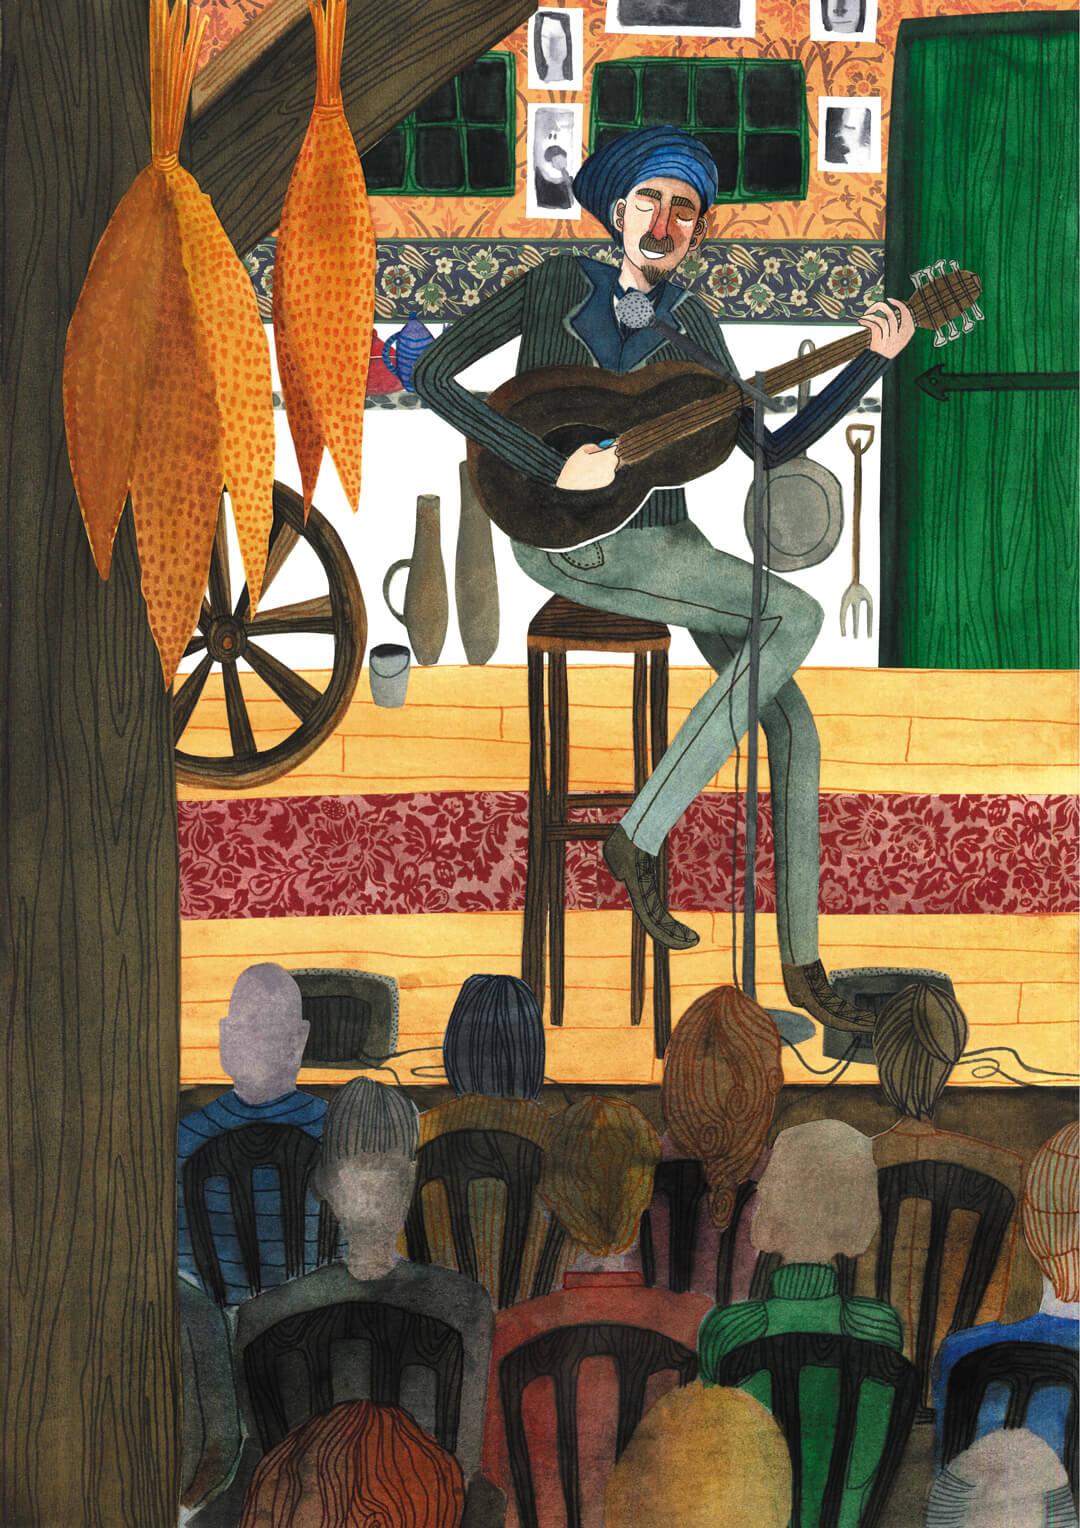 Sanne Bruinsma Illustraties & Vormgeving cultureel cafe De Amer Amen muziek podium concert optreden blues country